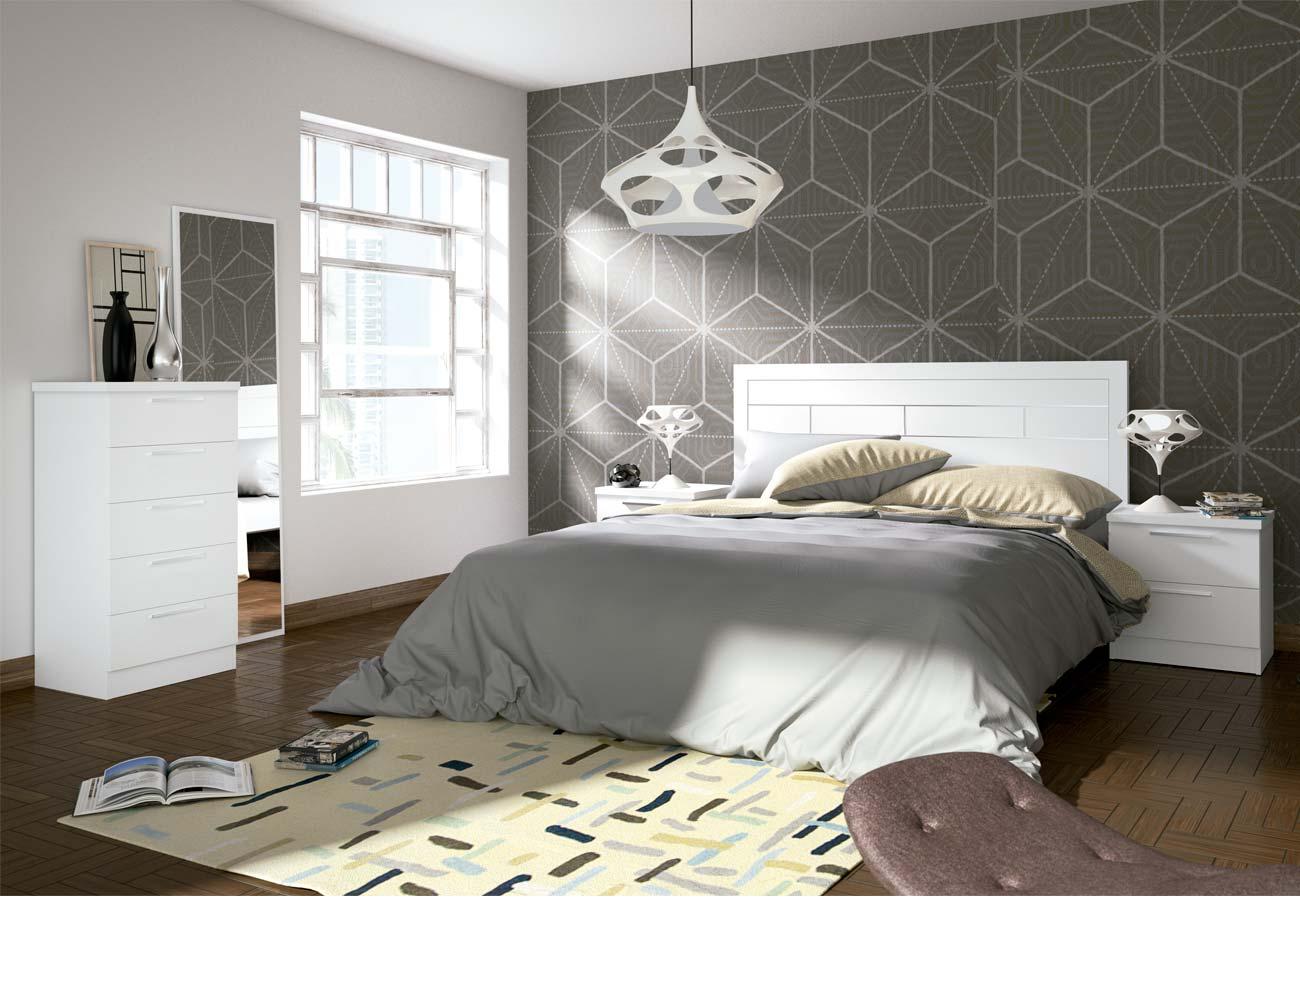 Dormitorio matrimonio moderno 36 blanco